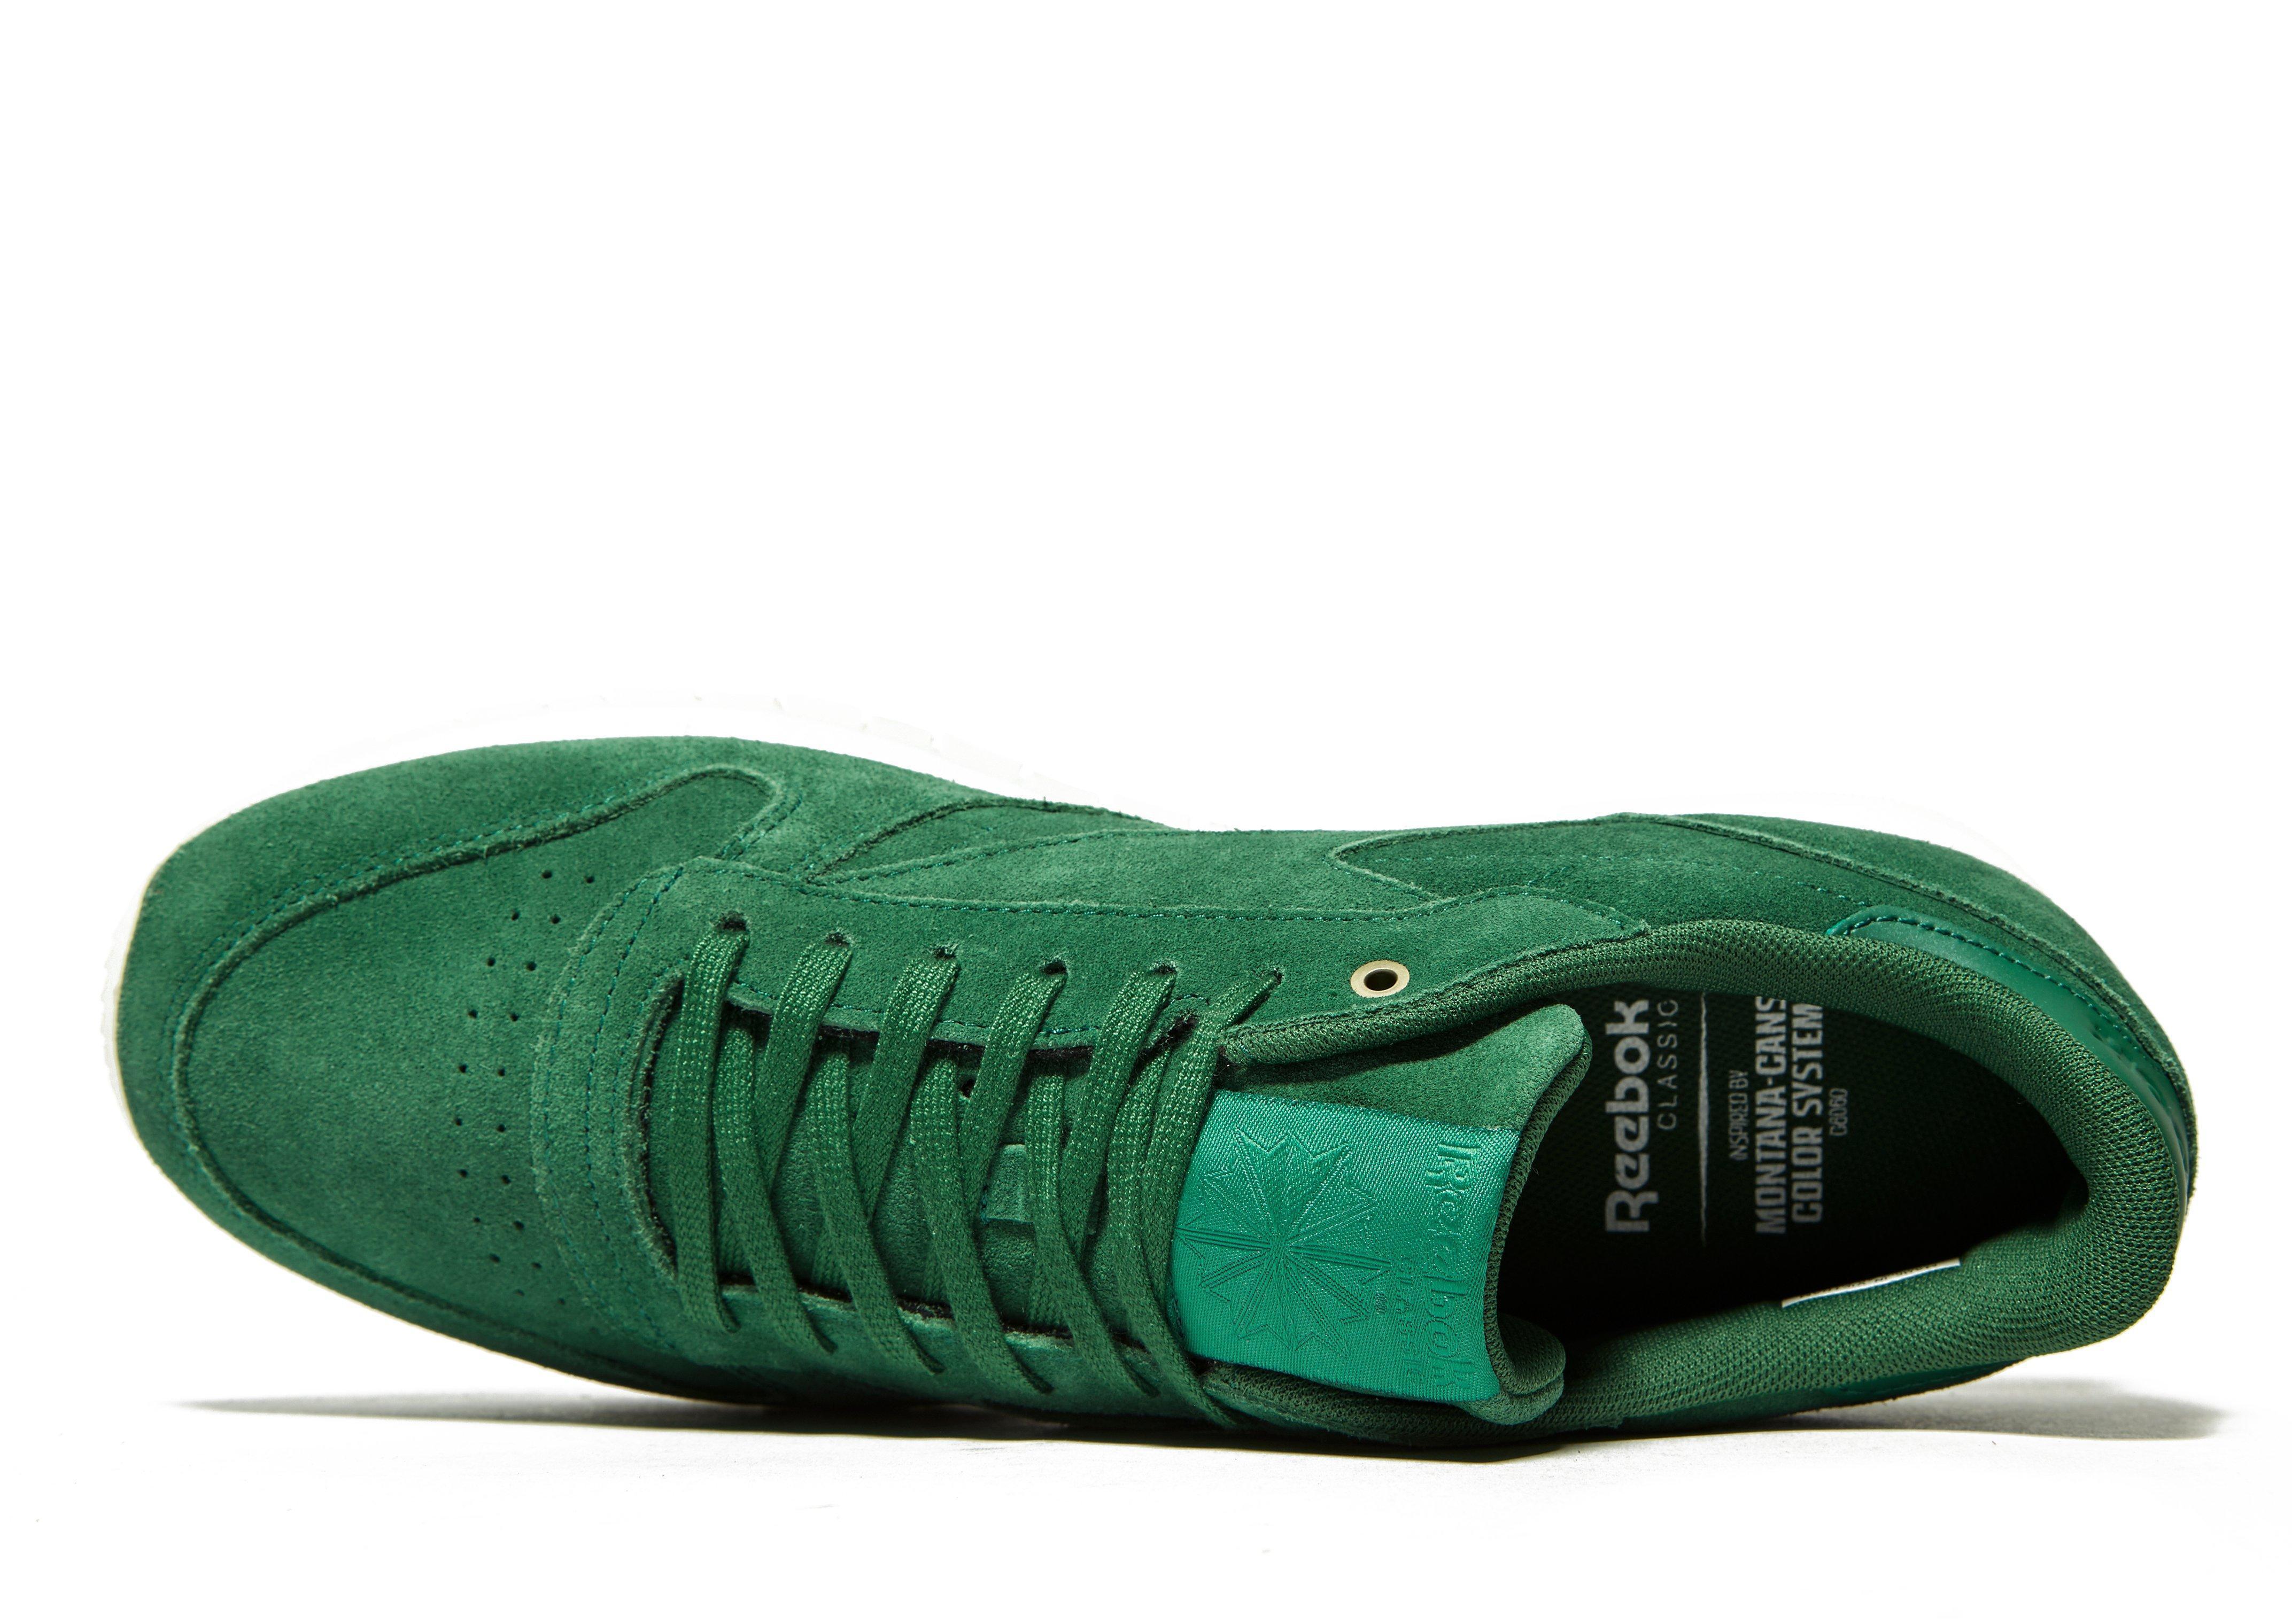 2e763688b3c1cc Lyst - Reebok Classic Leather Mcc in Green for Men